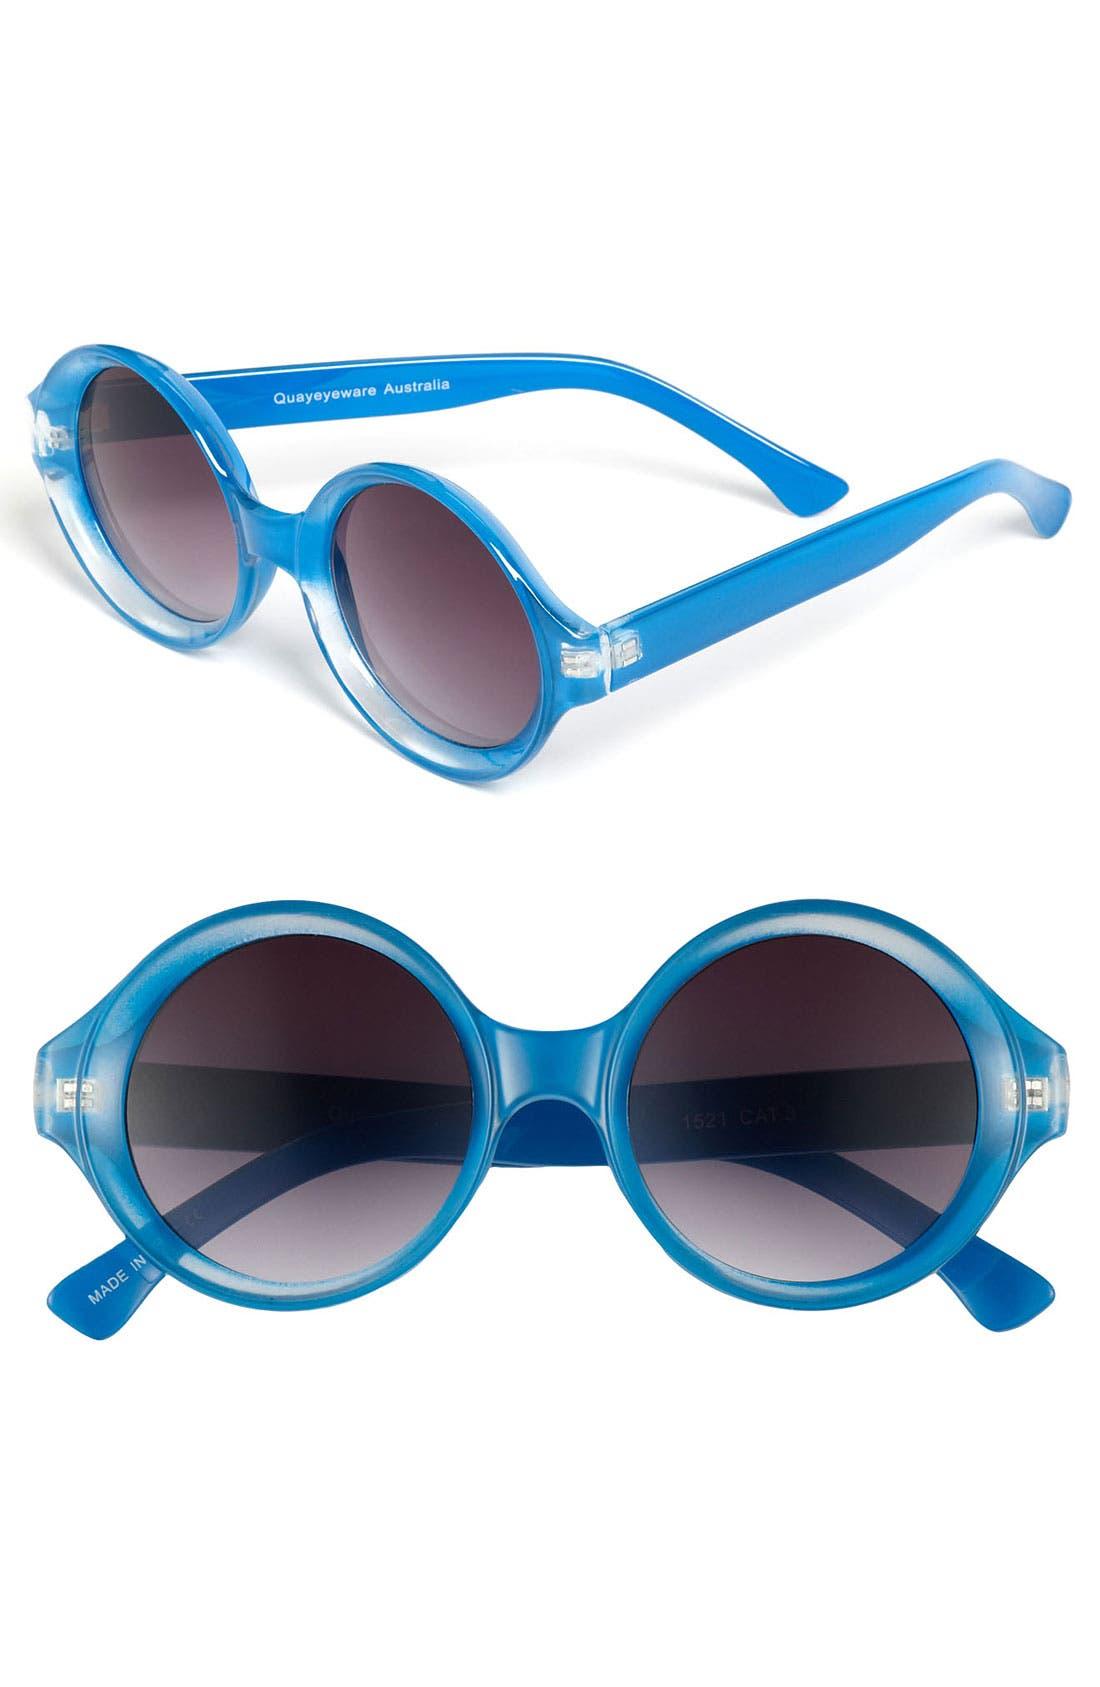 Main Image - Quay Sunglasses